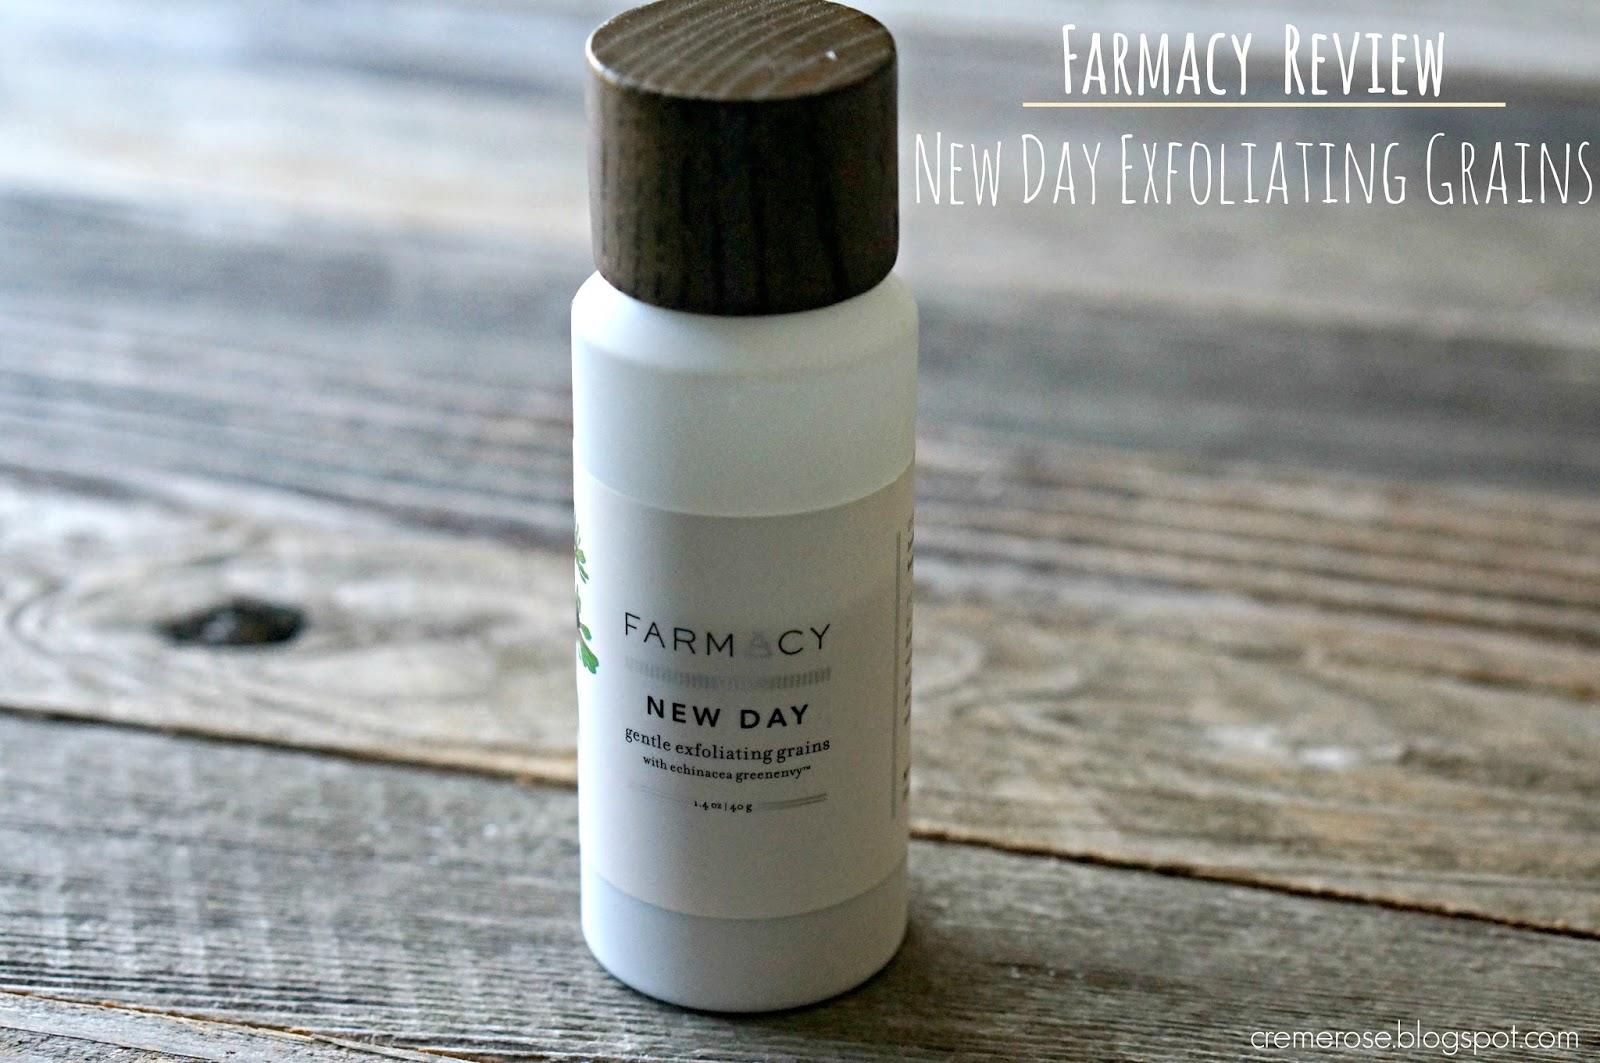 Skin | Farmacy New Day Gentle Exfoliating Grains